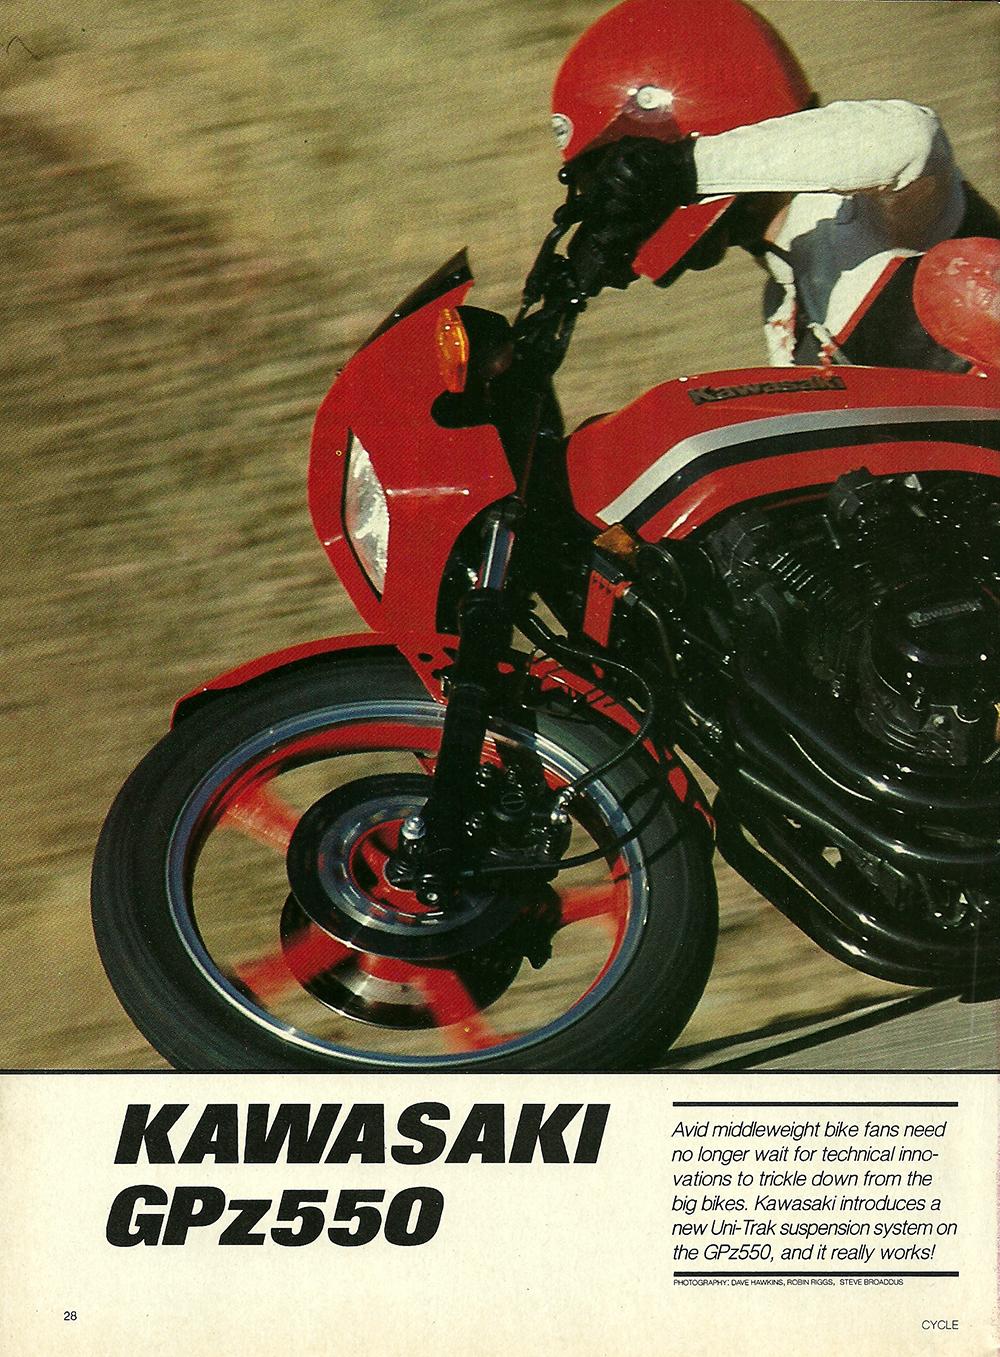 1982 Kawasaki GPz550 road test 01.jpg